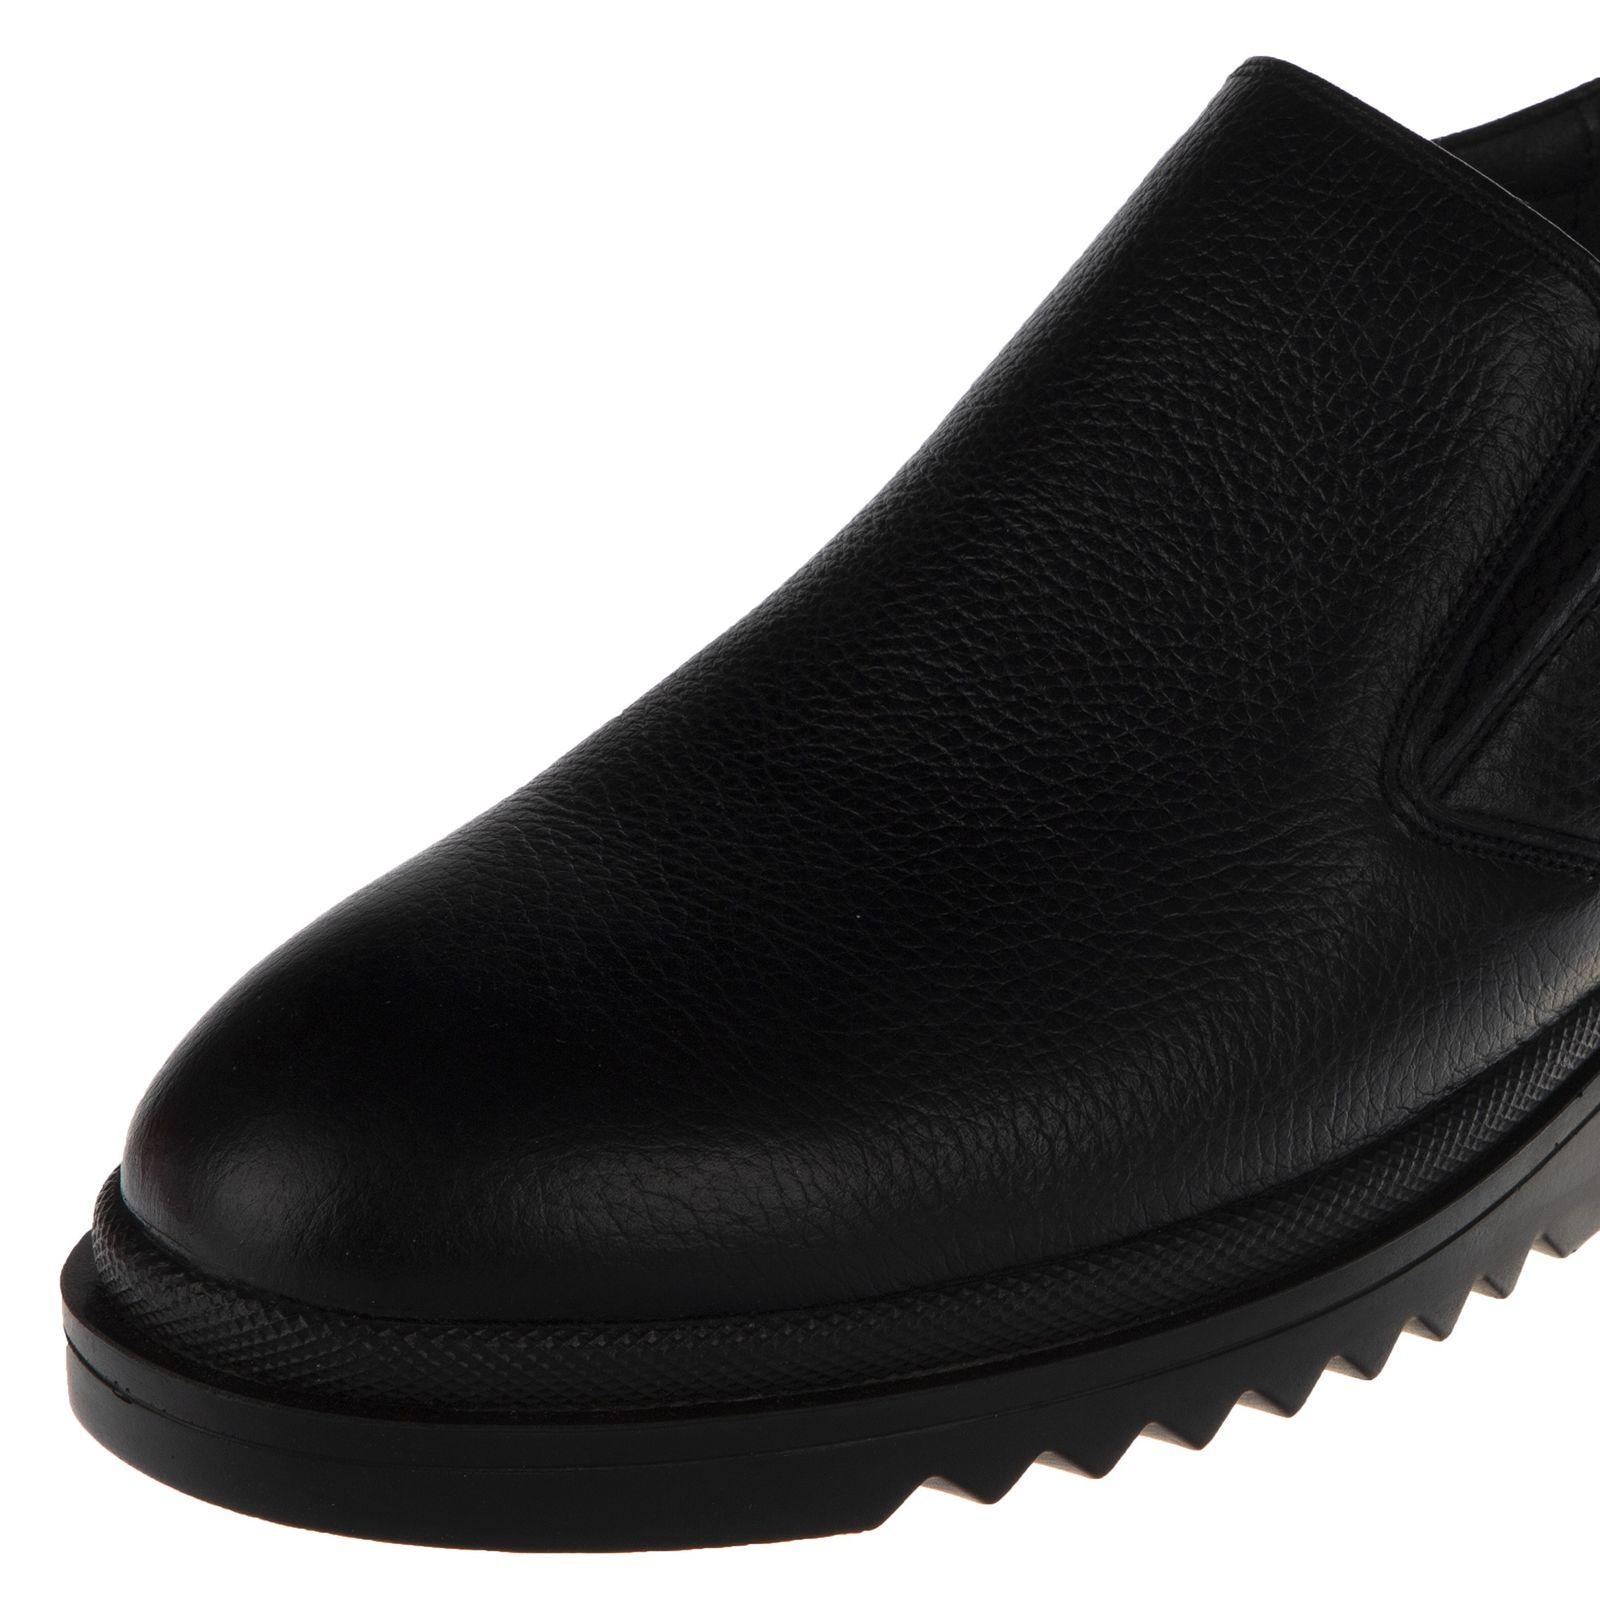 کفش روزمره مردانه شیفر مدل 7160A-101 -  - 8